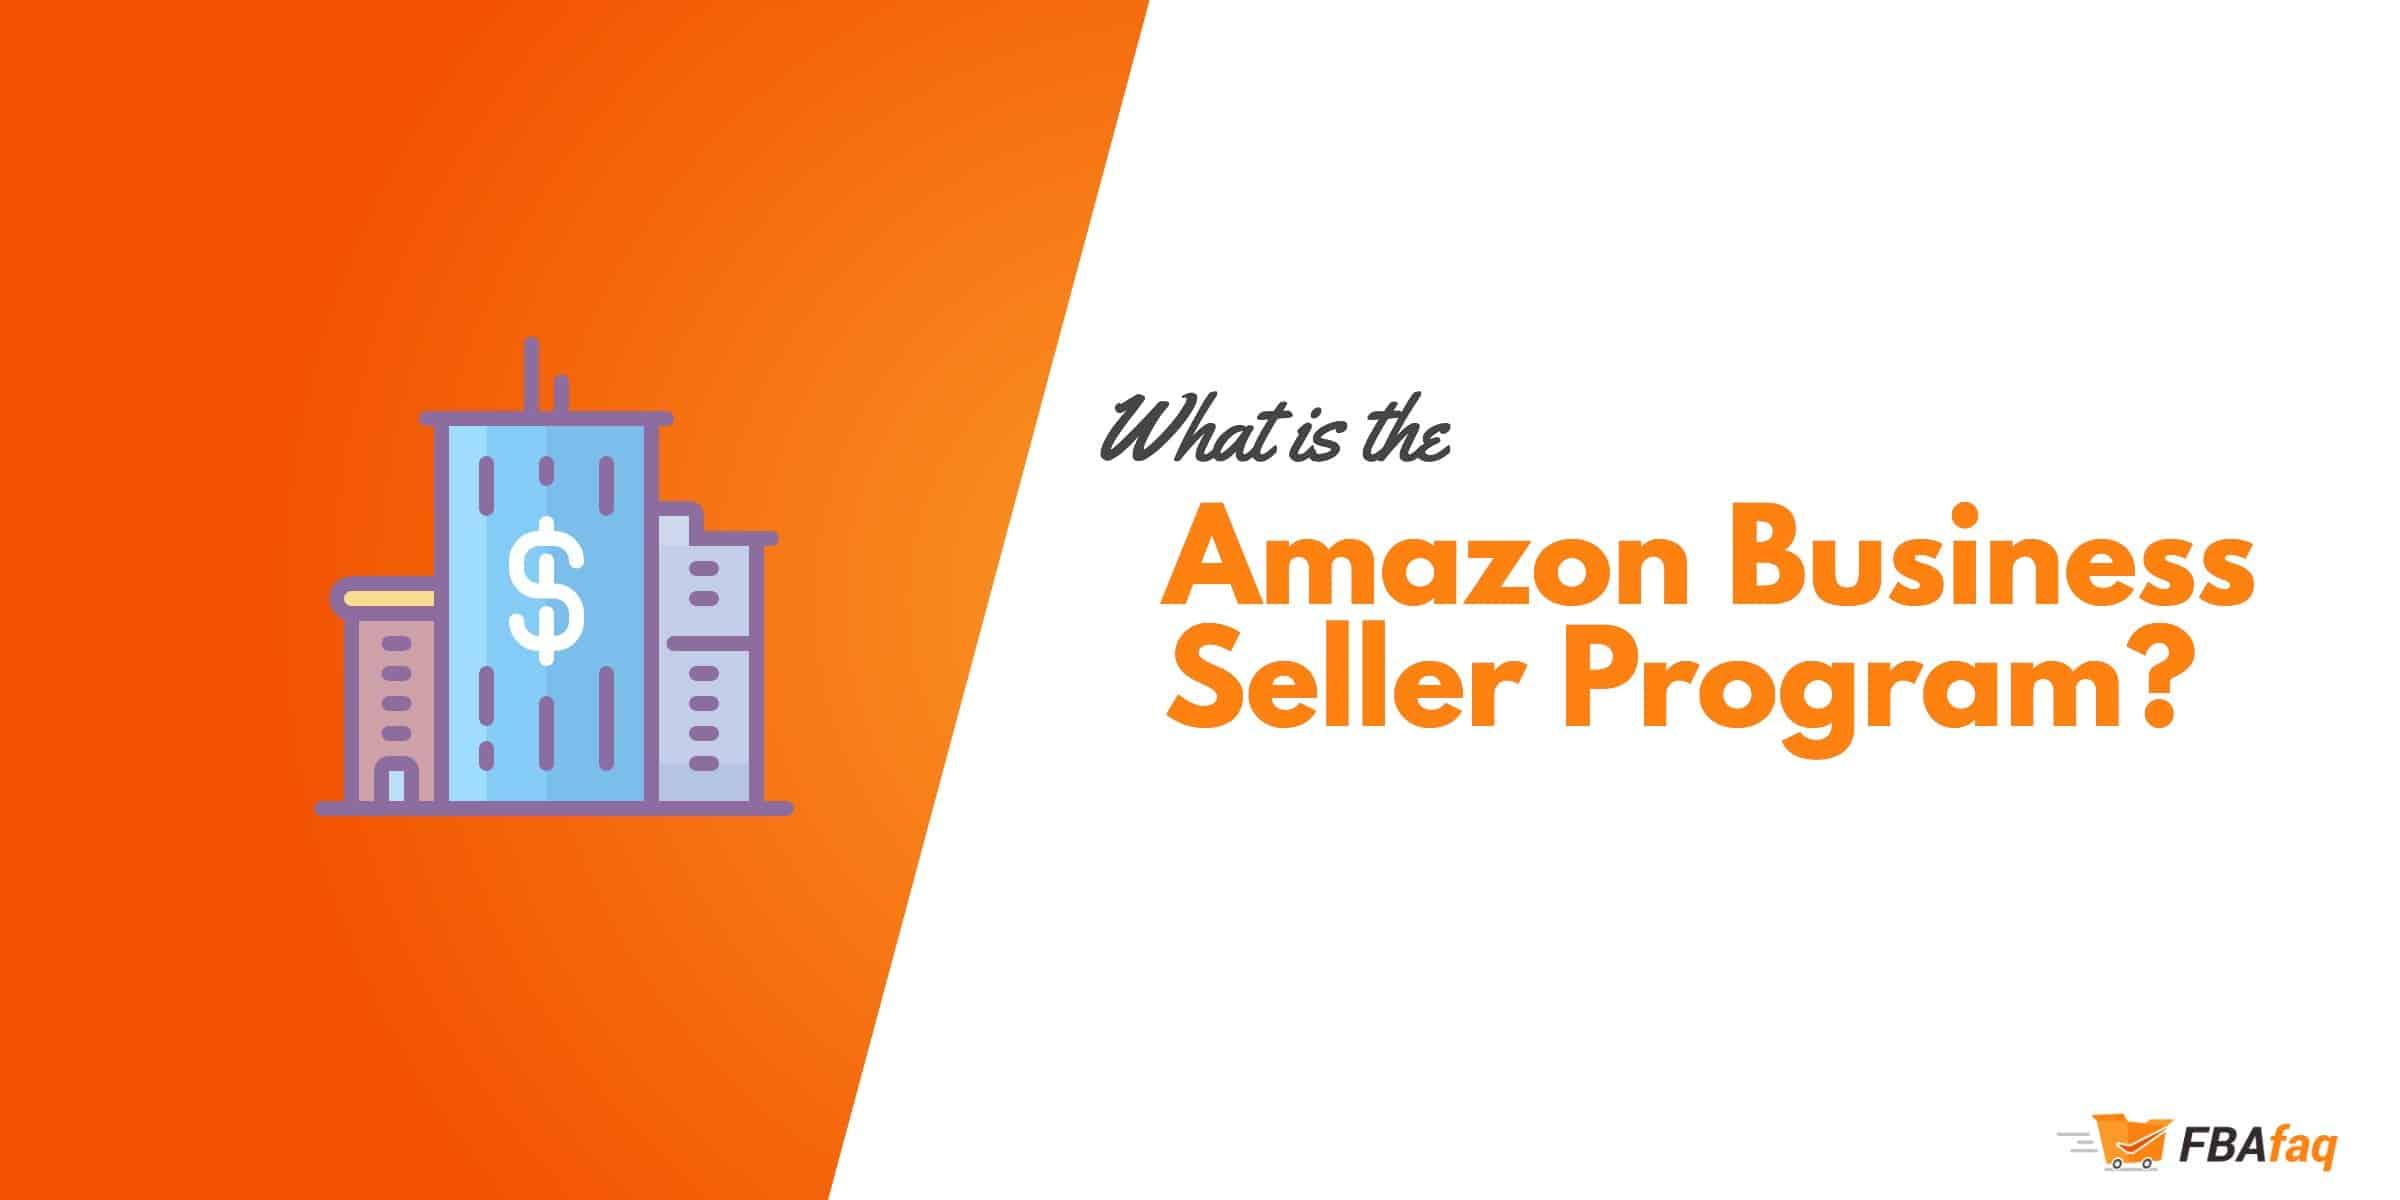 Amazon business seller program (1)